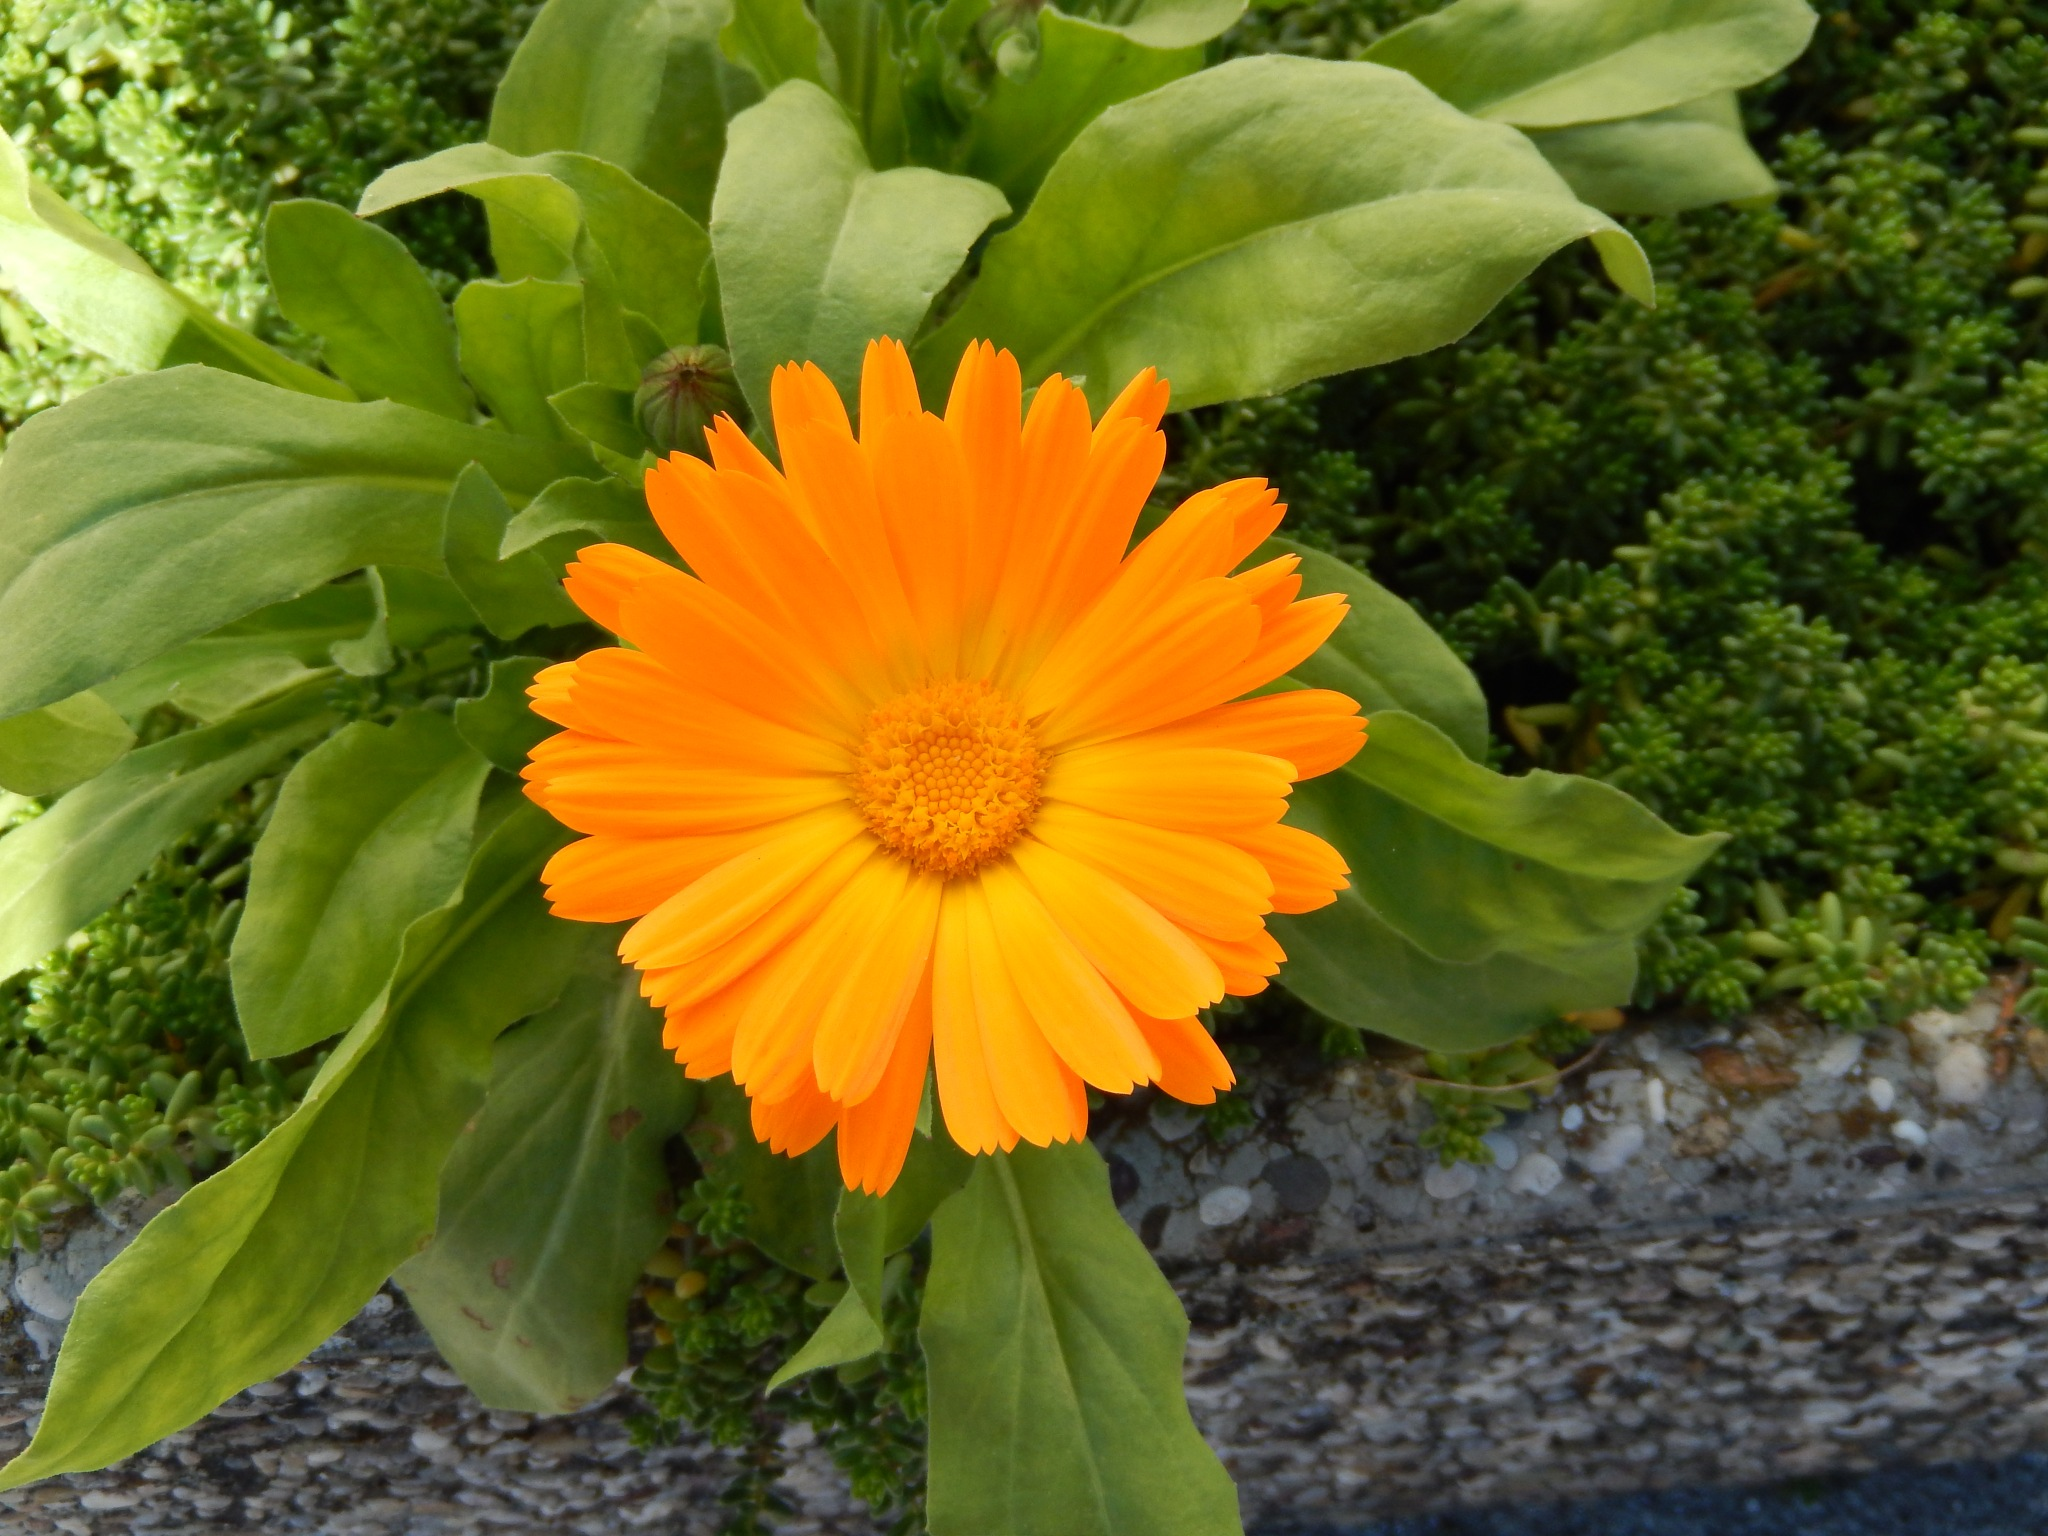 Calendula officinalis - Vrtni ognjič by zvnktomasevic